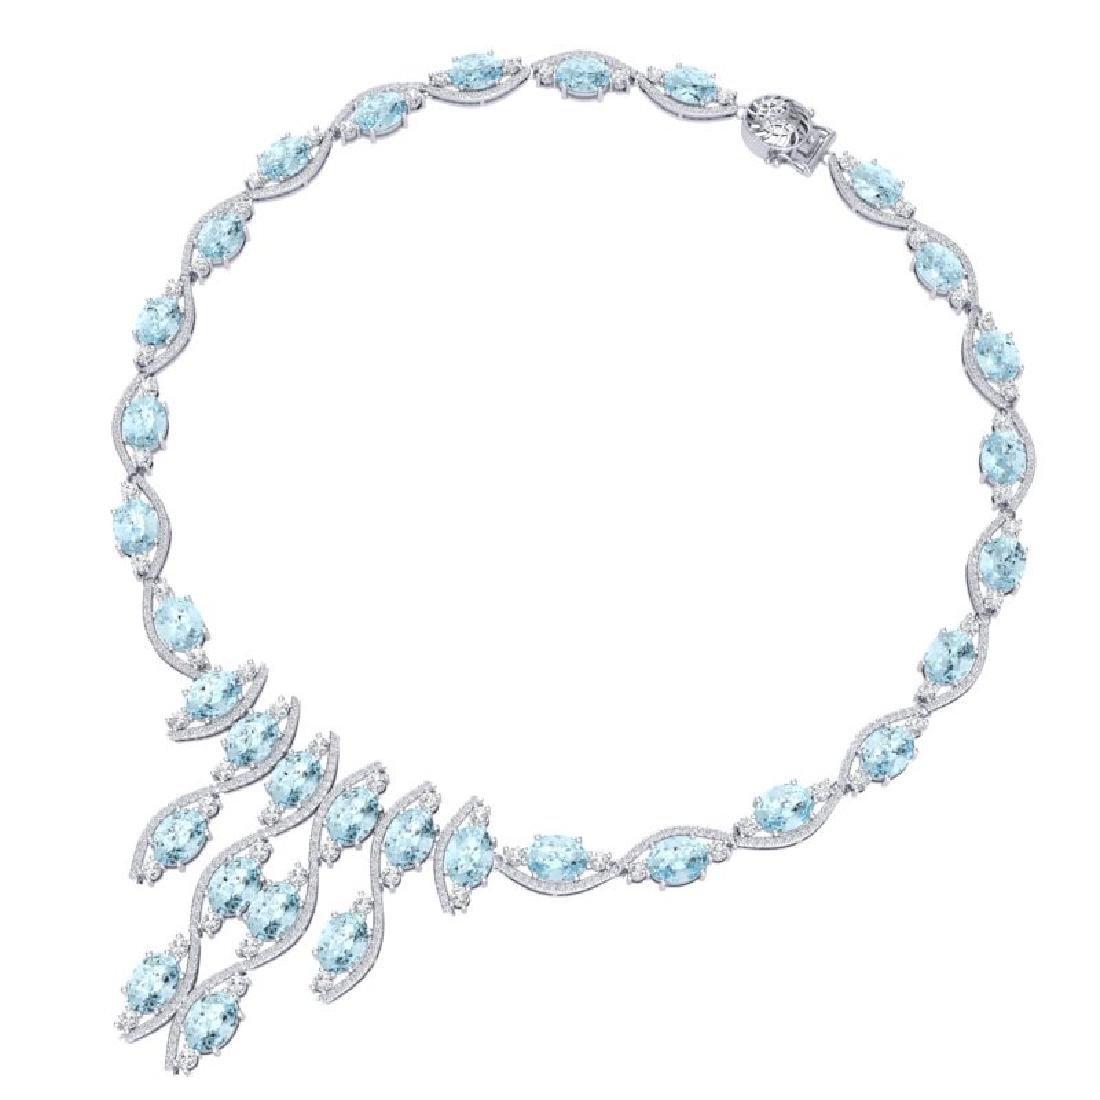 68.12 CTW Royalty Sky Topaz & VS Diamond Necklace 18K - 3